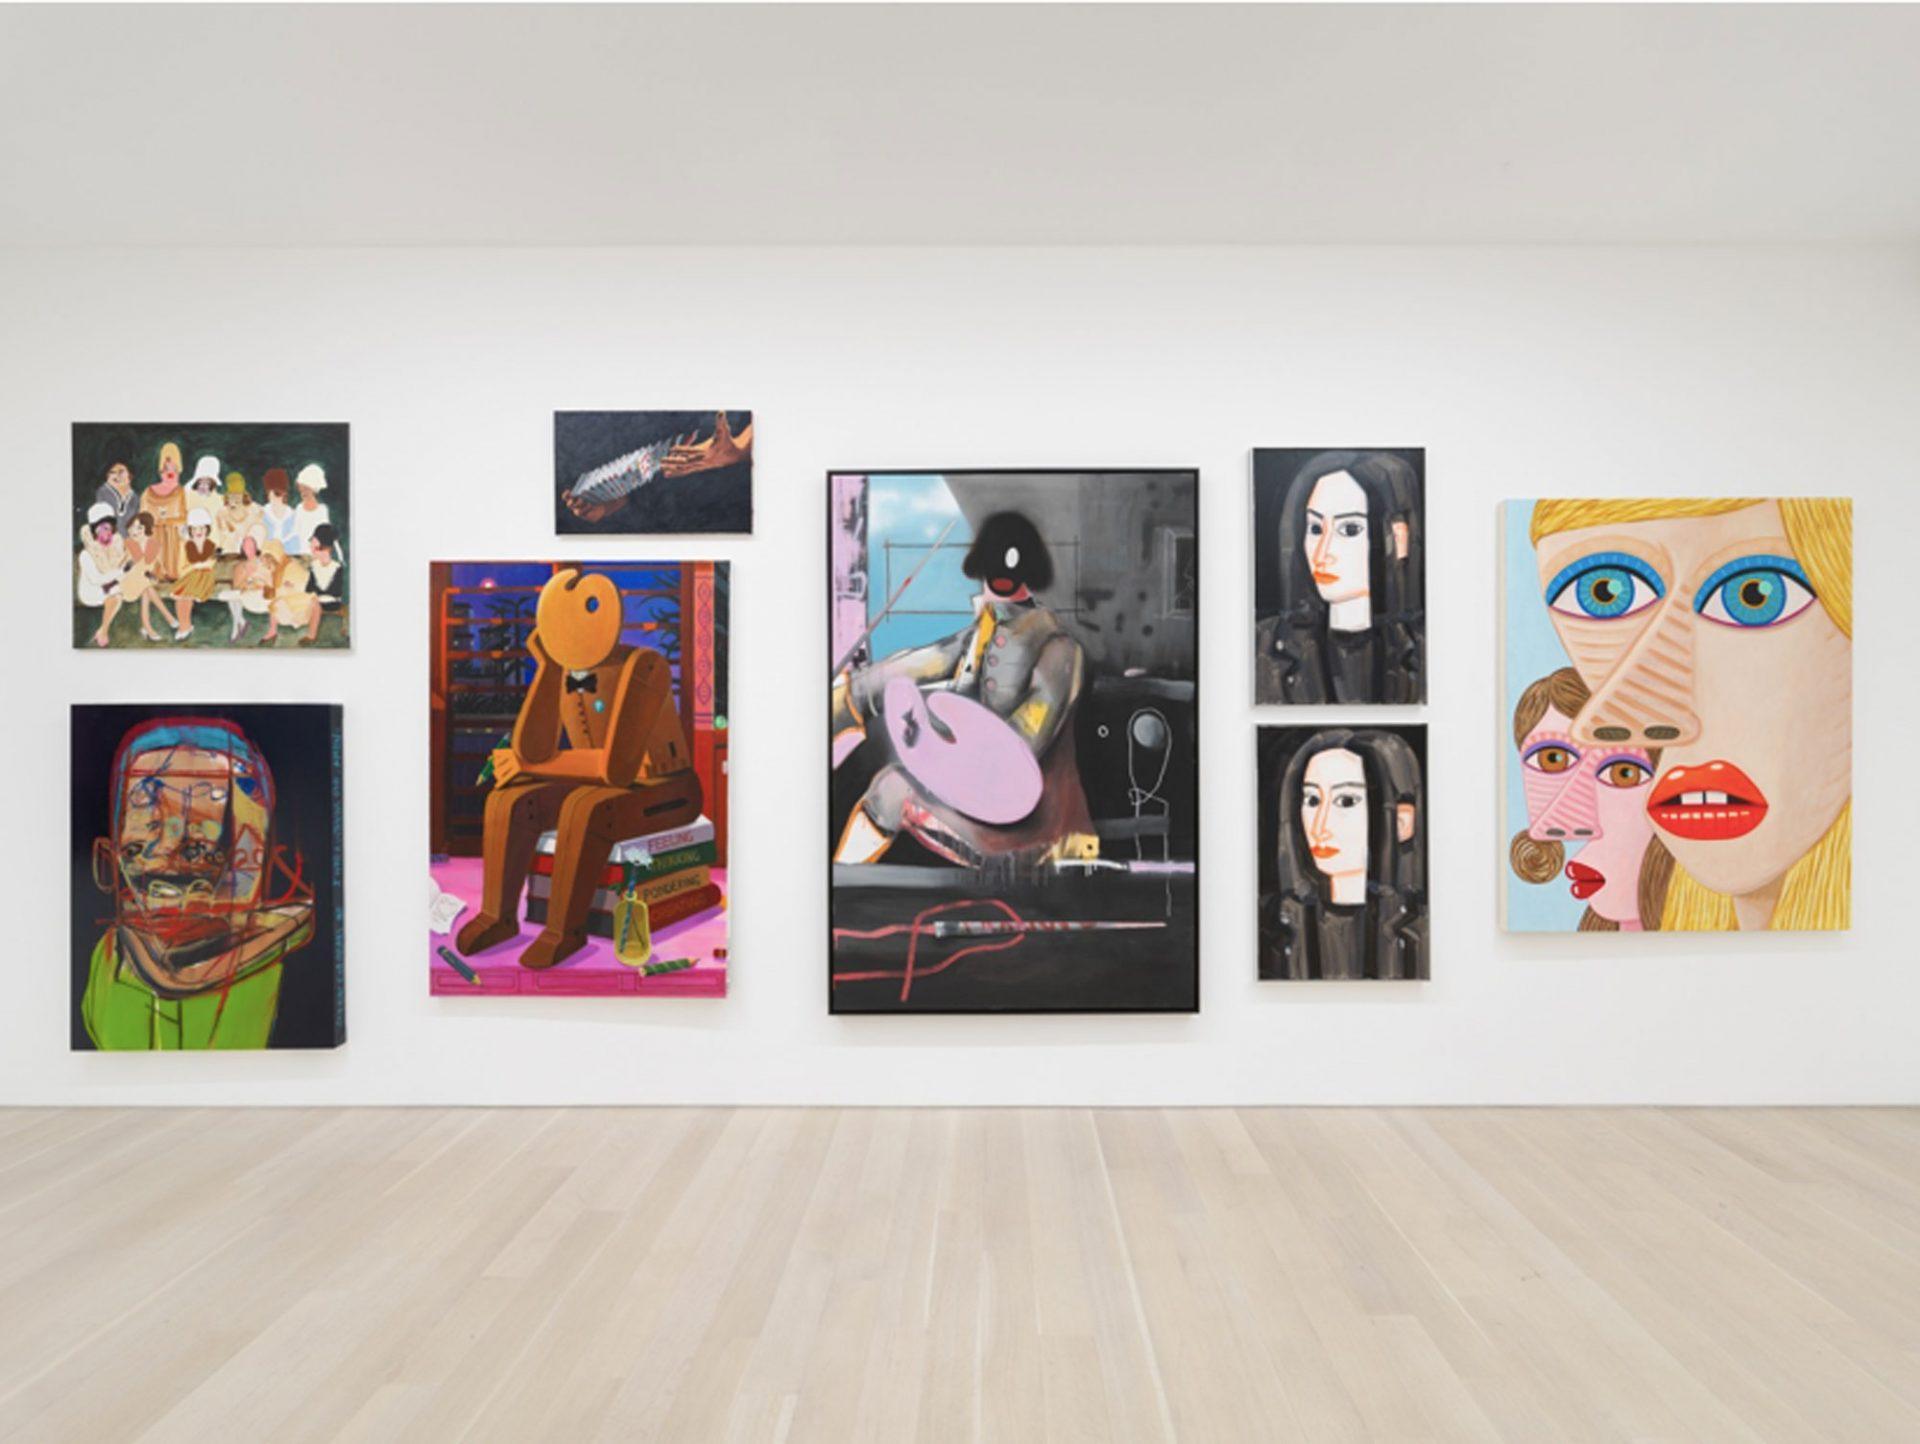 Salon de Peinture, Almine Rech Gallery